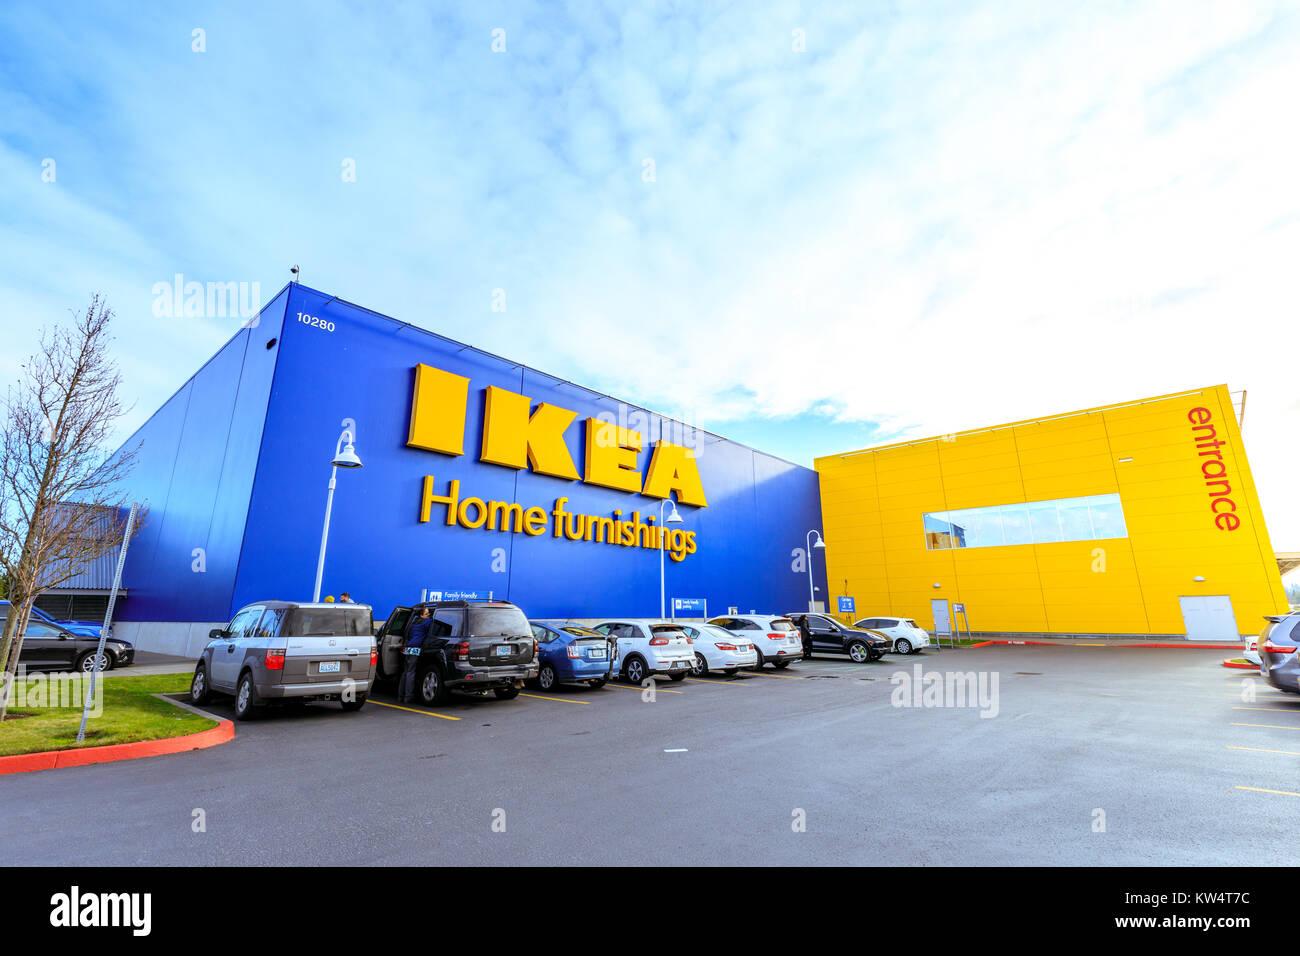 Ikea Store Usa Stock Photos Ikea Store Usa Stock Images